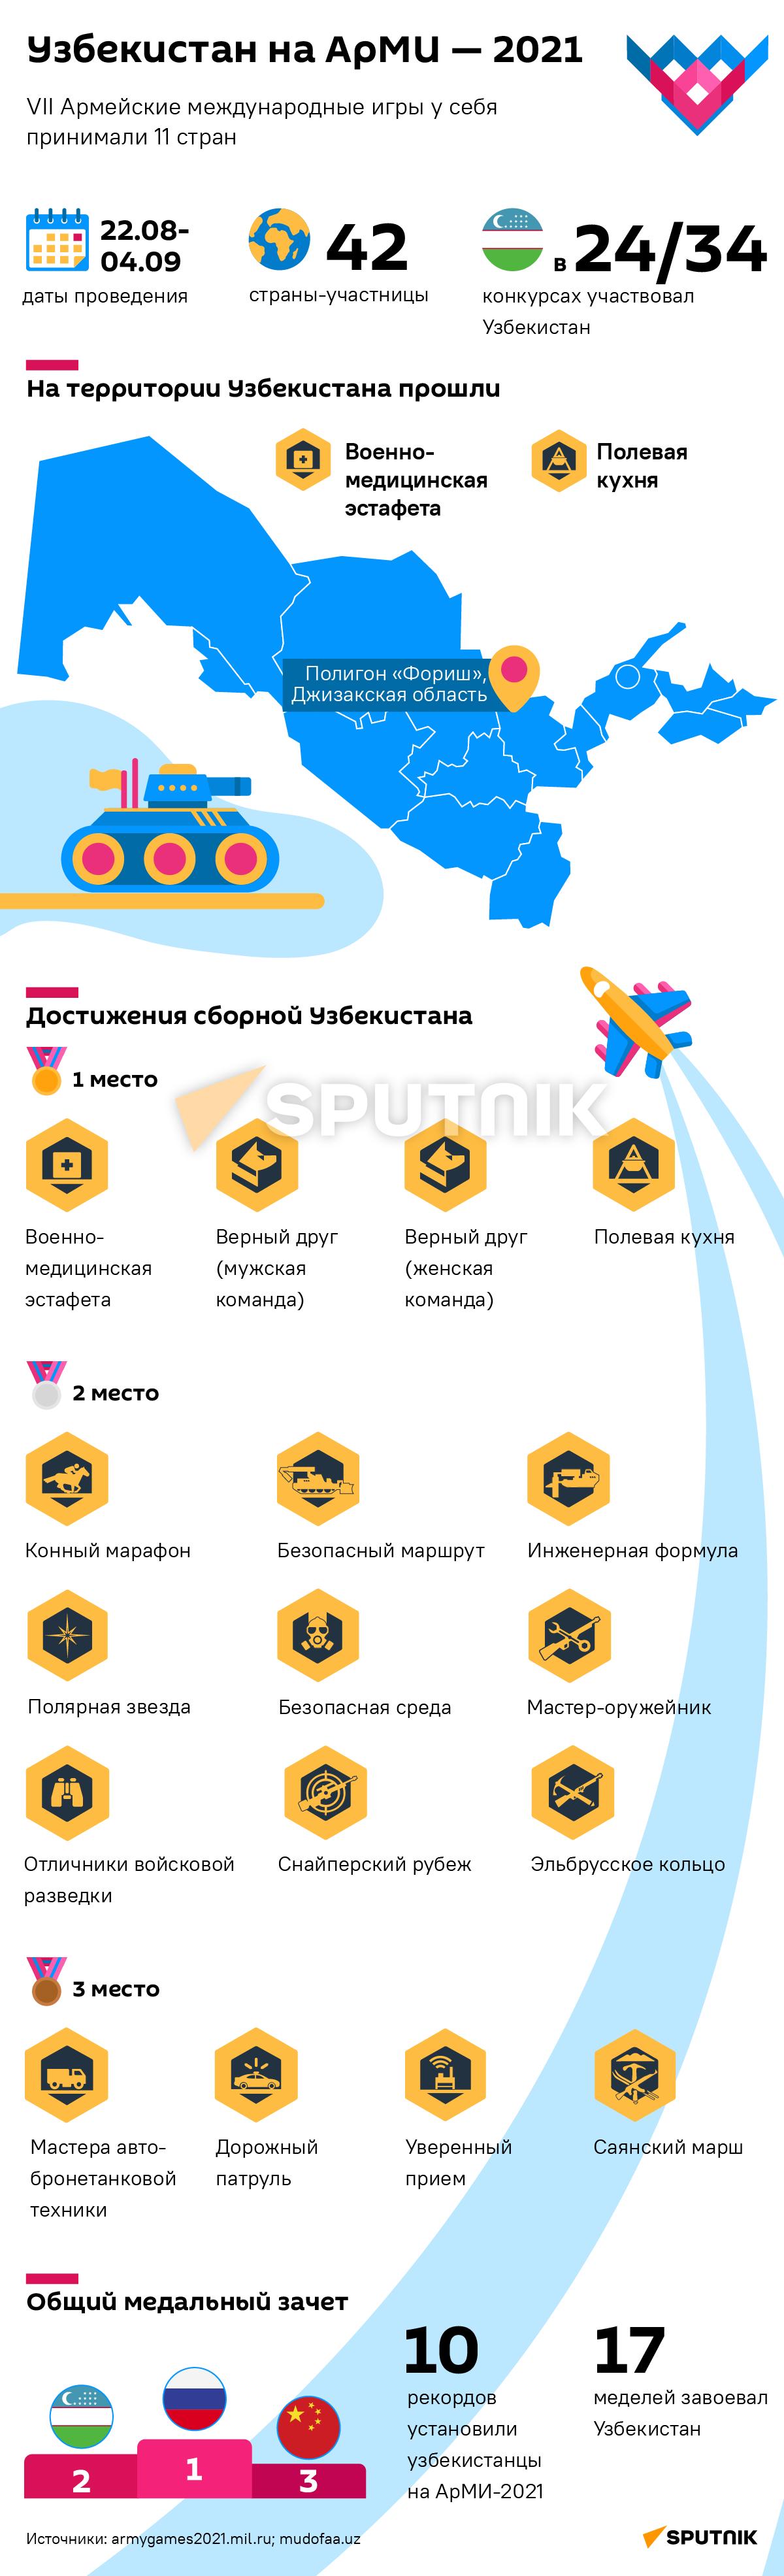 Узбекистан на АрМИ-2021 деск - Sputnik Узбекистан